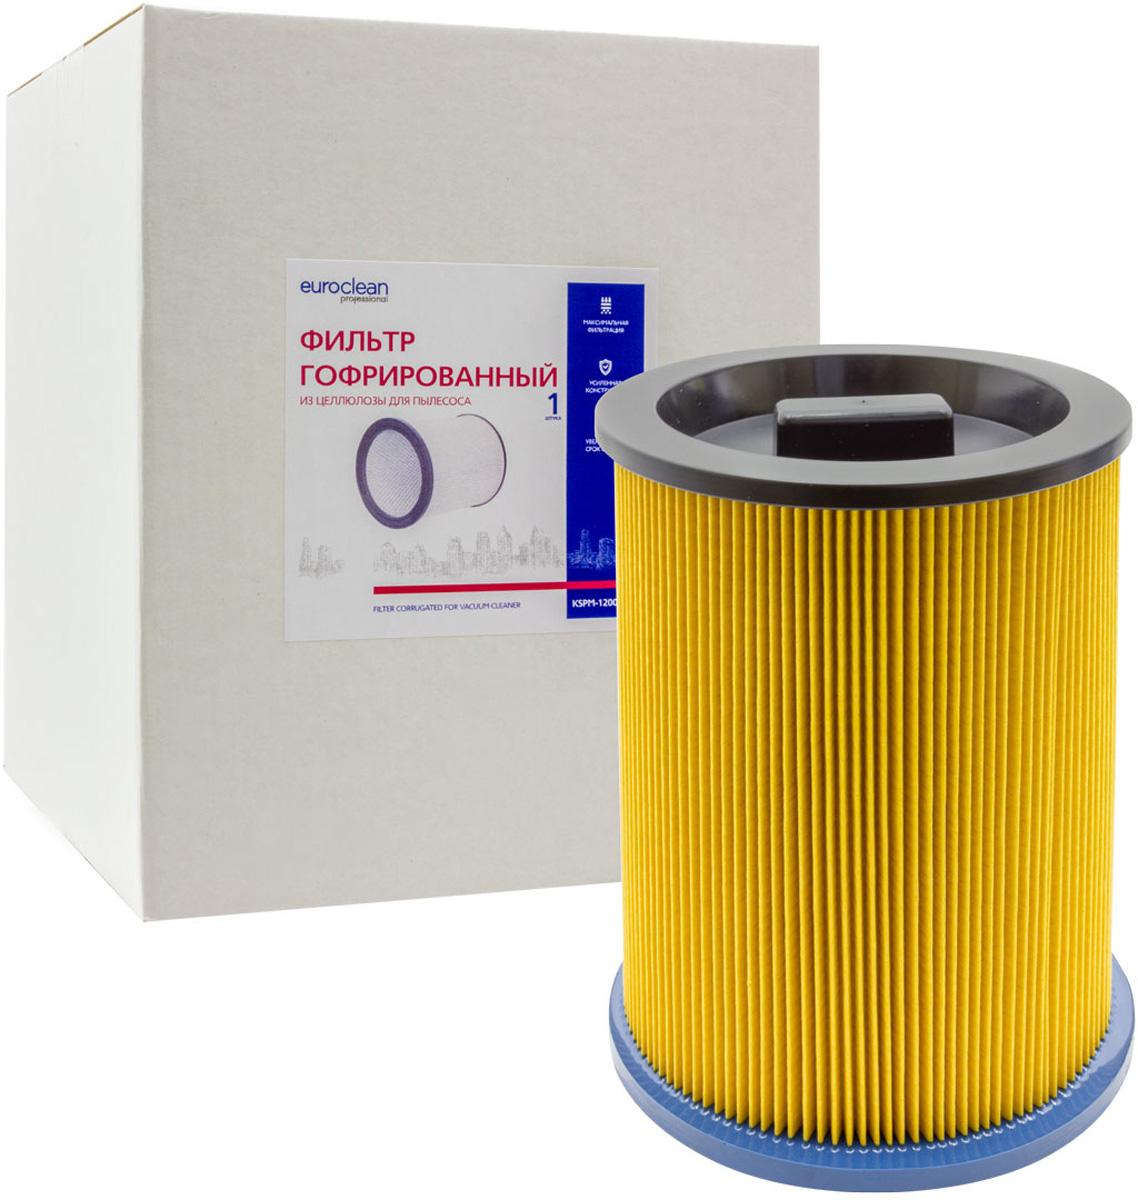 Фильтр Euroclean KSPM-1200NTX складчатый для сухой пыли к пылесосам Kress (аналог 98043501)